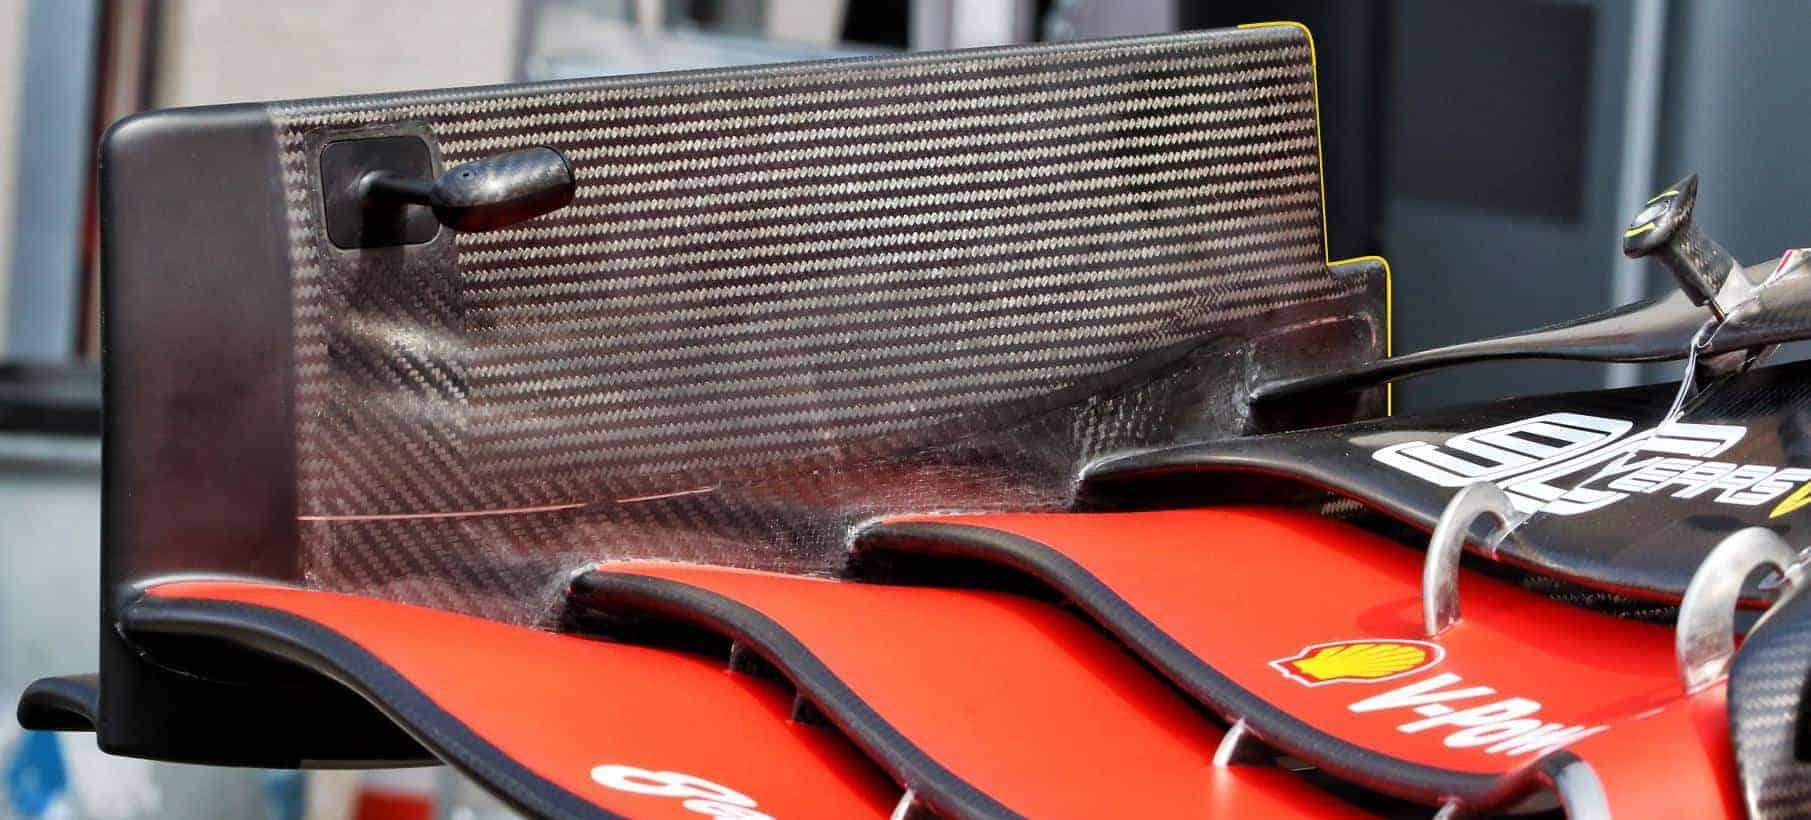 Ferrari SF90 new front wing inside shot French GP F1 2019 Photo AMuS Edited by MAXF1net